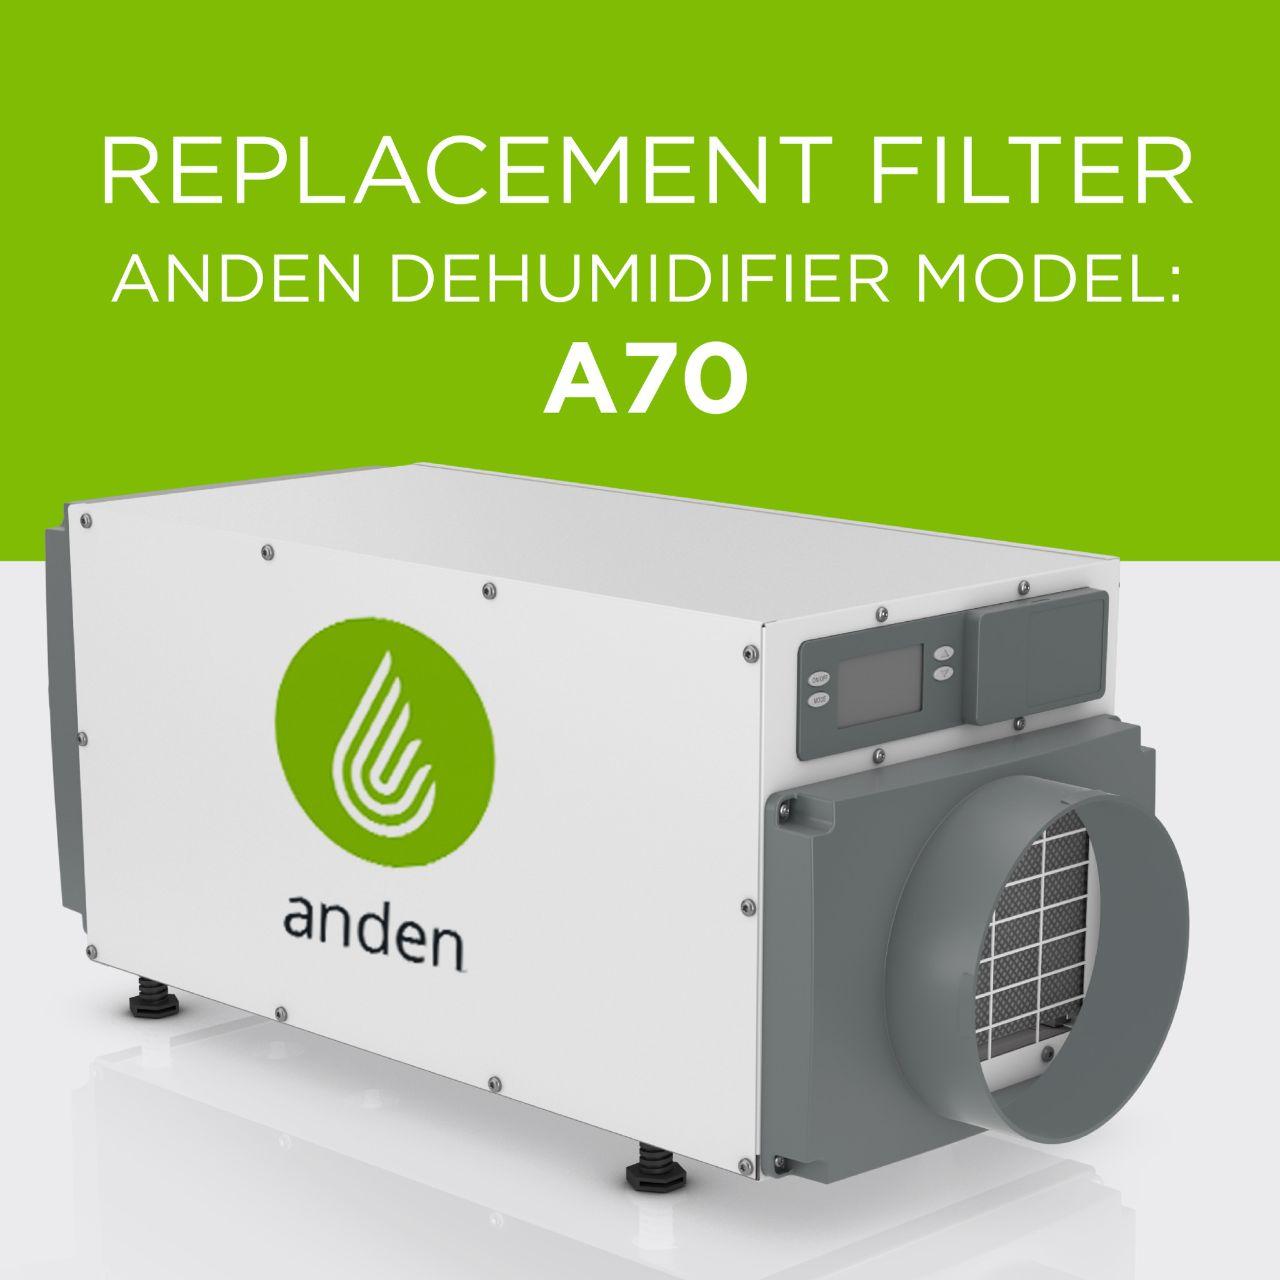 Anden-Model-A70-Dehumidifier-Replacement-Air Filter